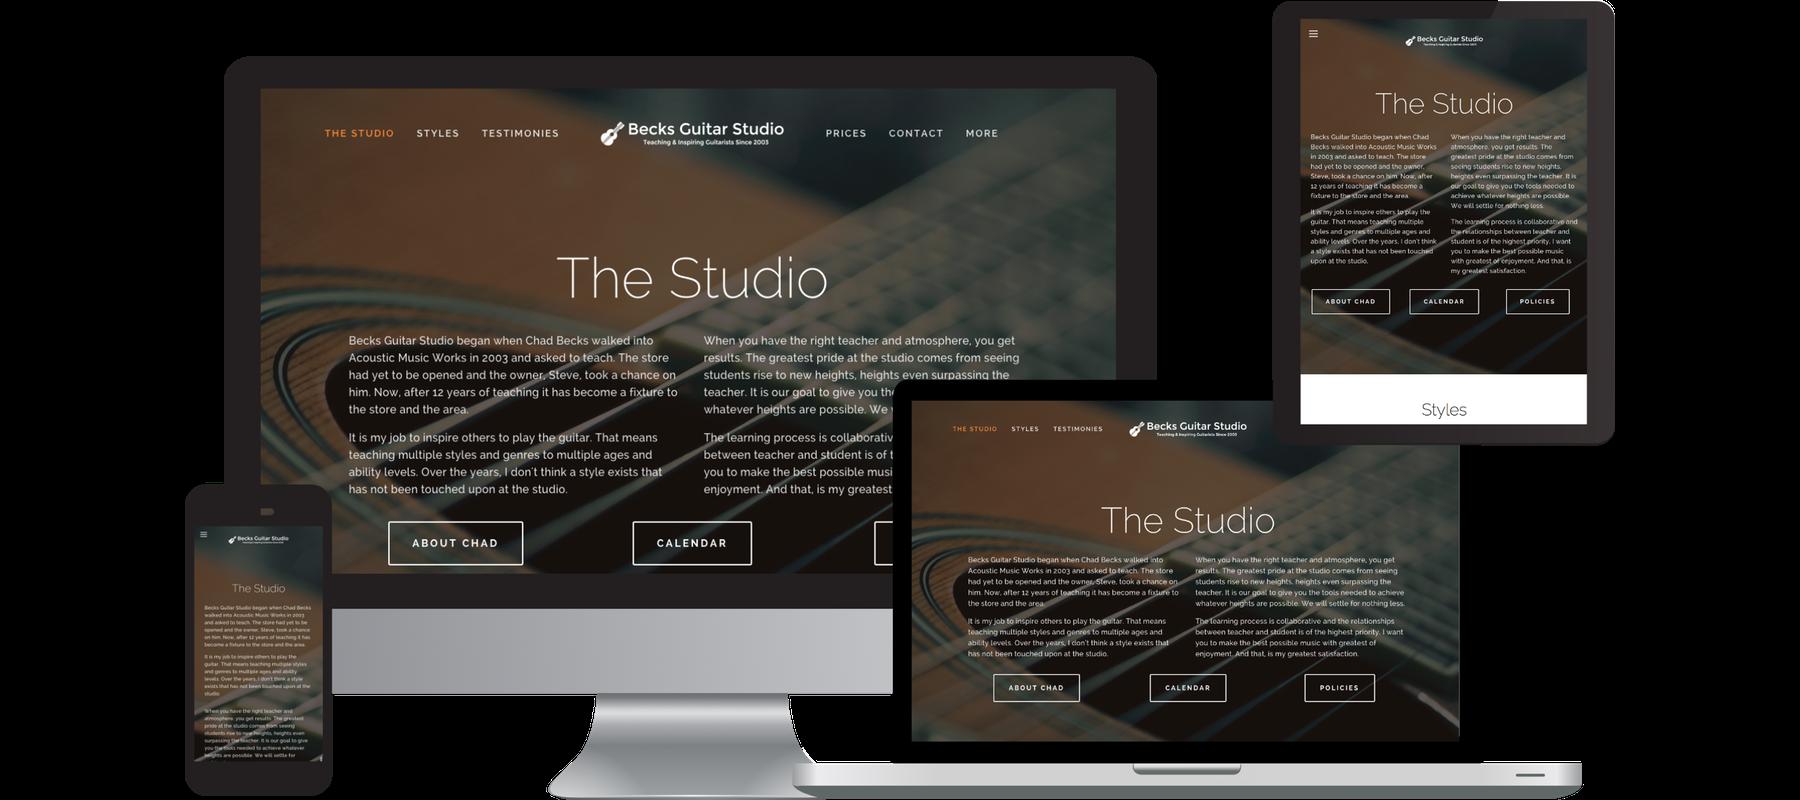 kisspng-laptop-responsive-web-design-nyse-bgs-design-studi-multi-style-5ae9fb9fa1bfa7.7342723615252837436625.png